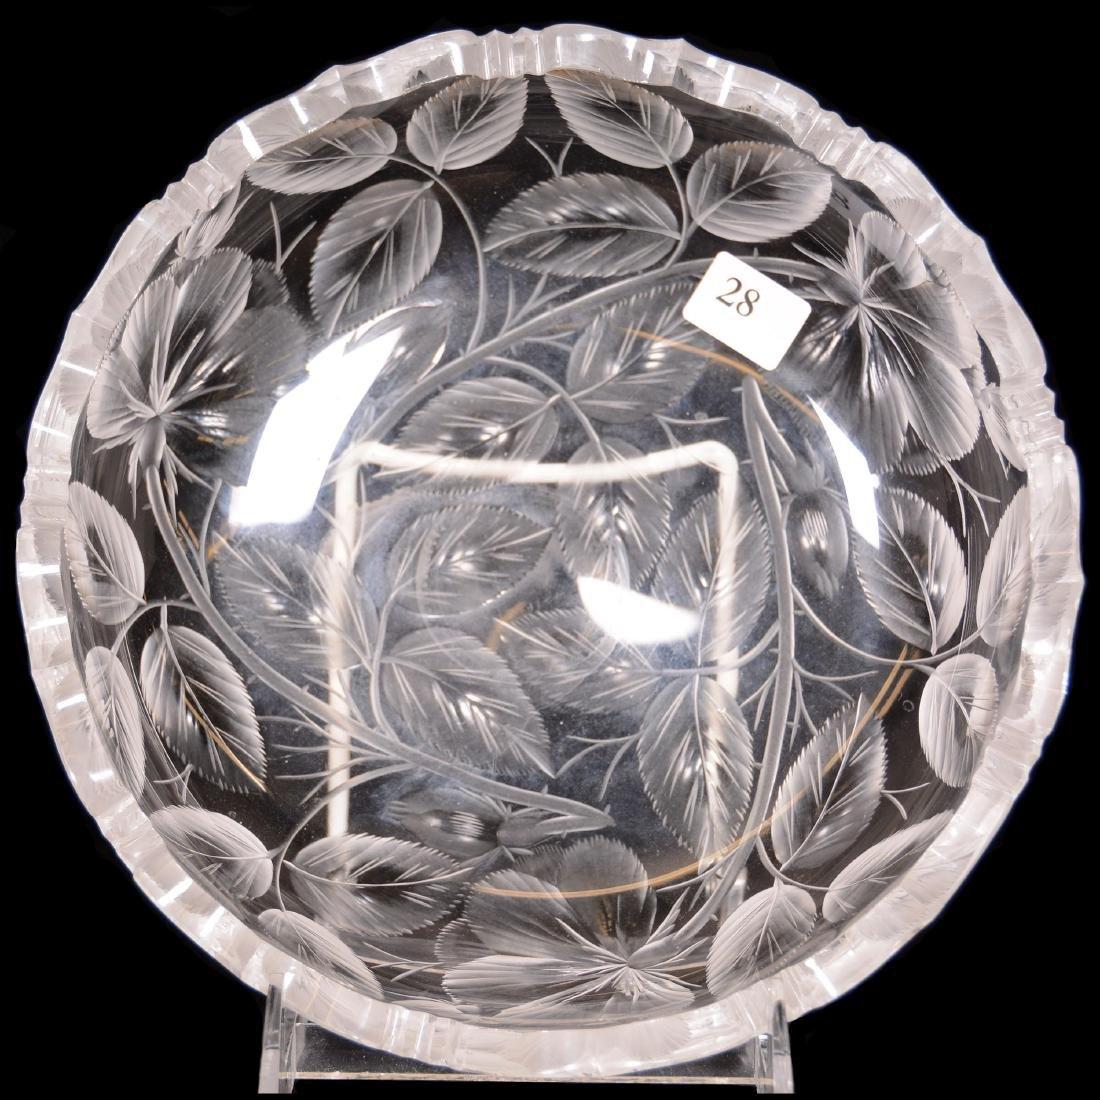 American Brilliant Cut Glass Low Bowl - 3